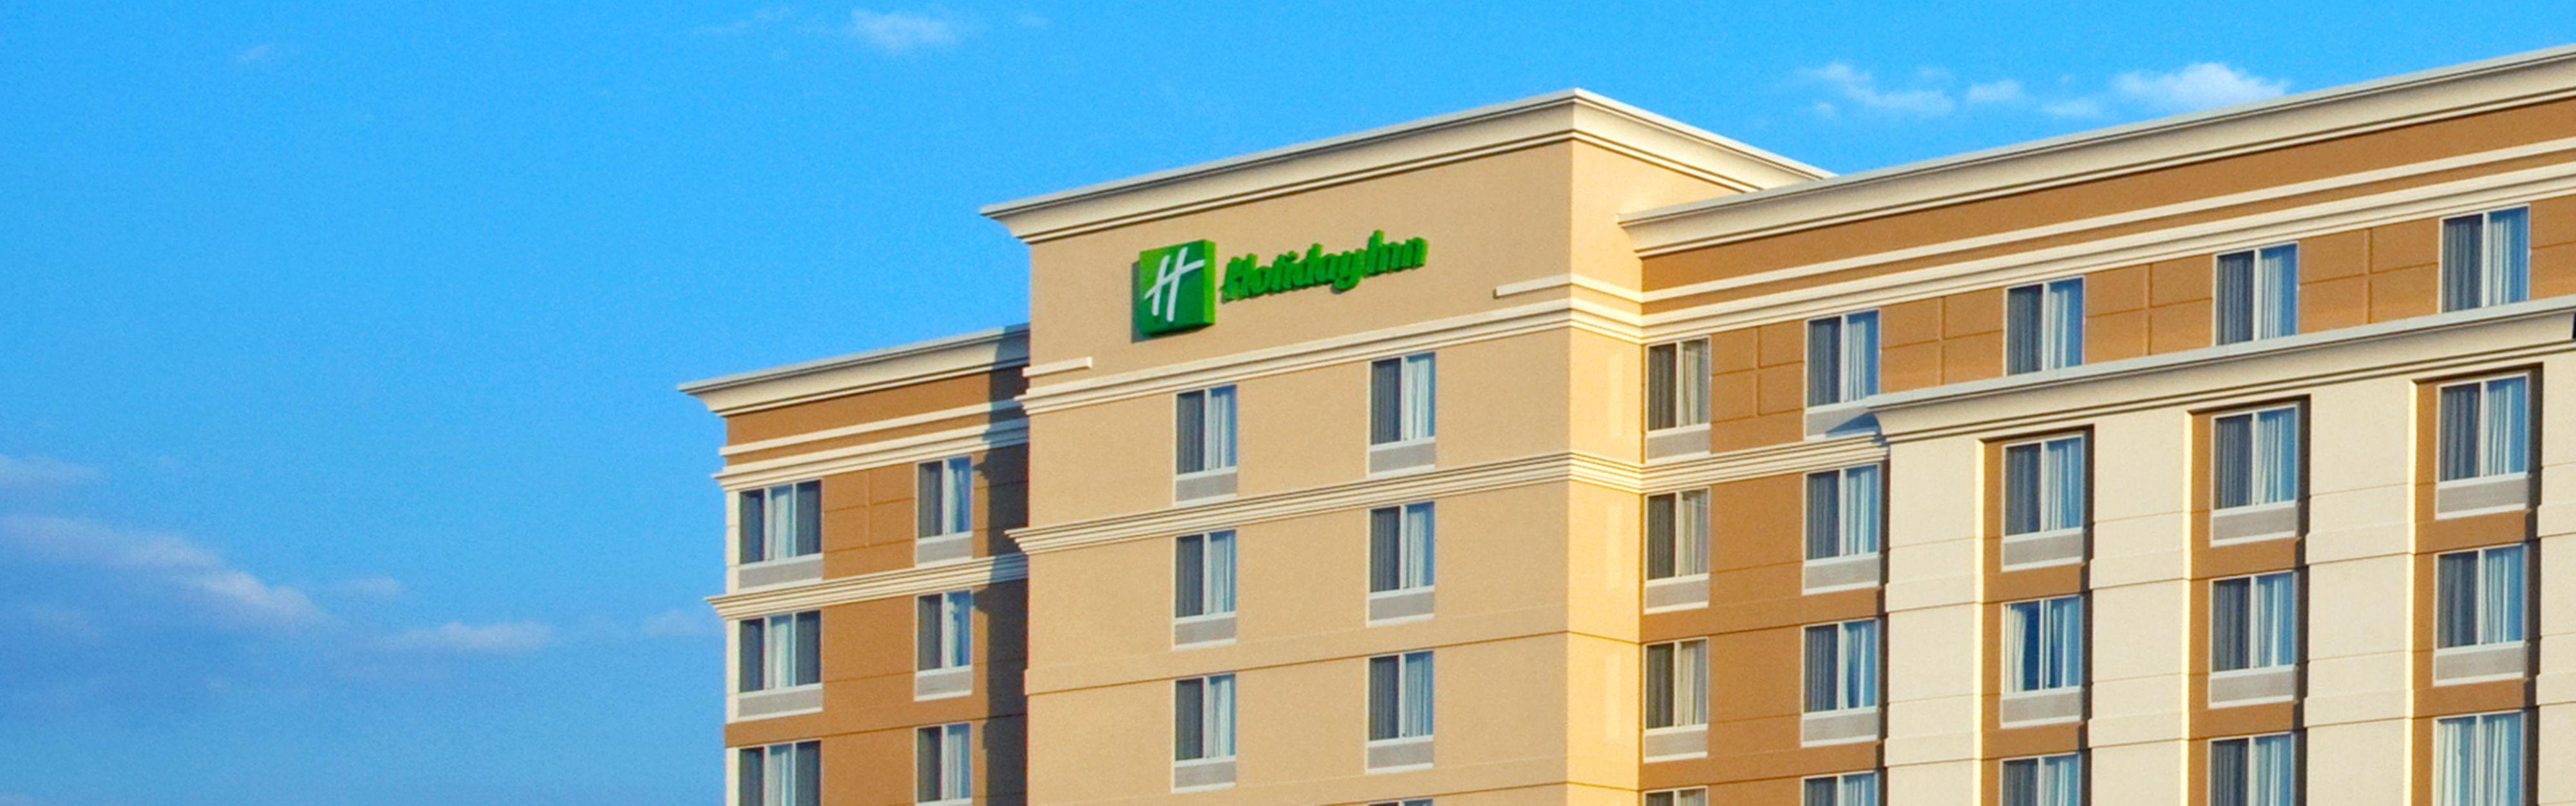 Holiday Inn Raleigh-Durham Airport image 0